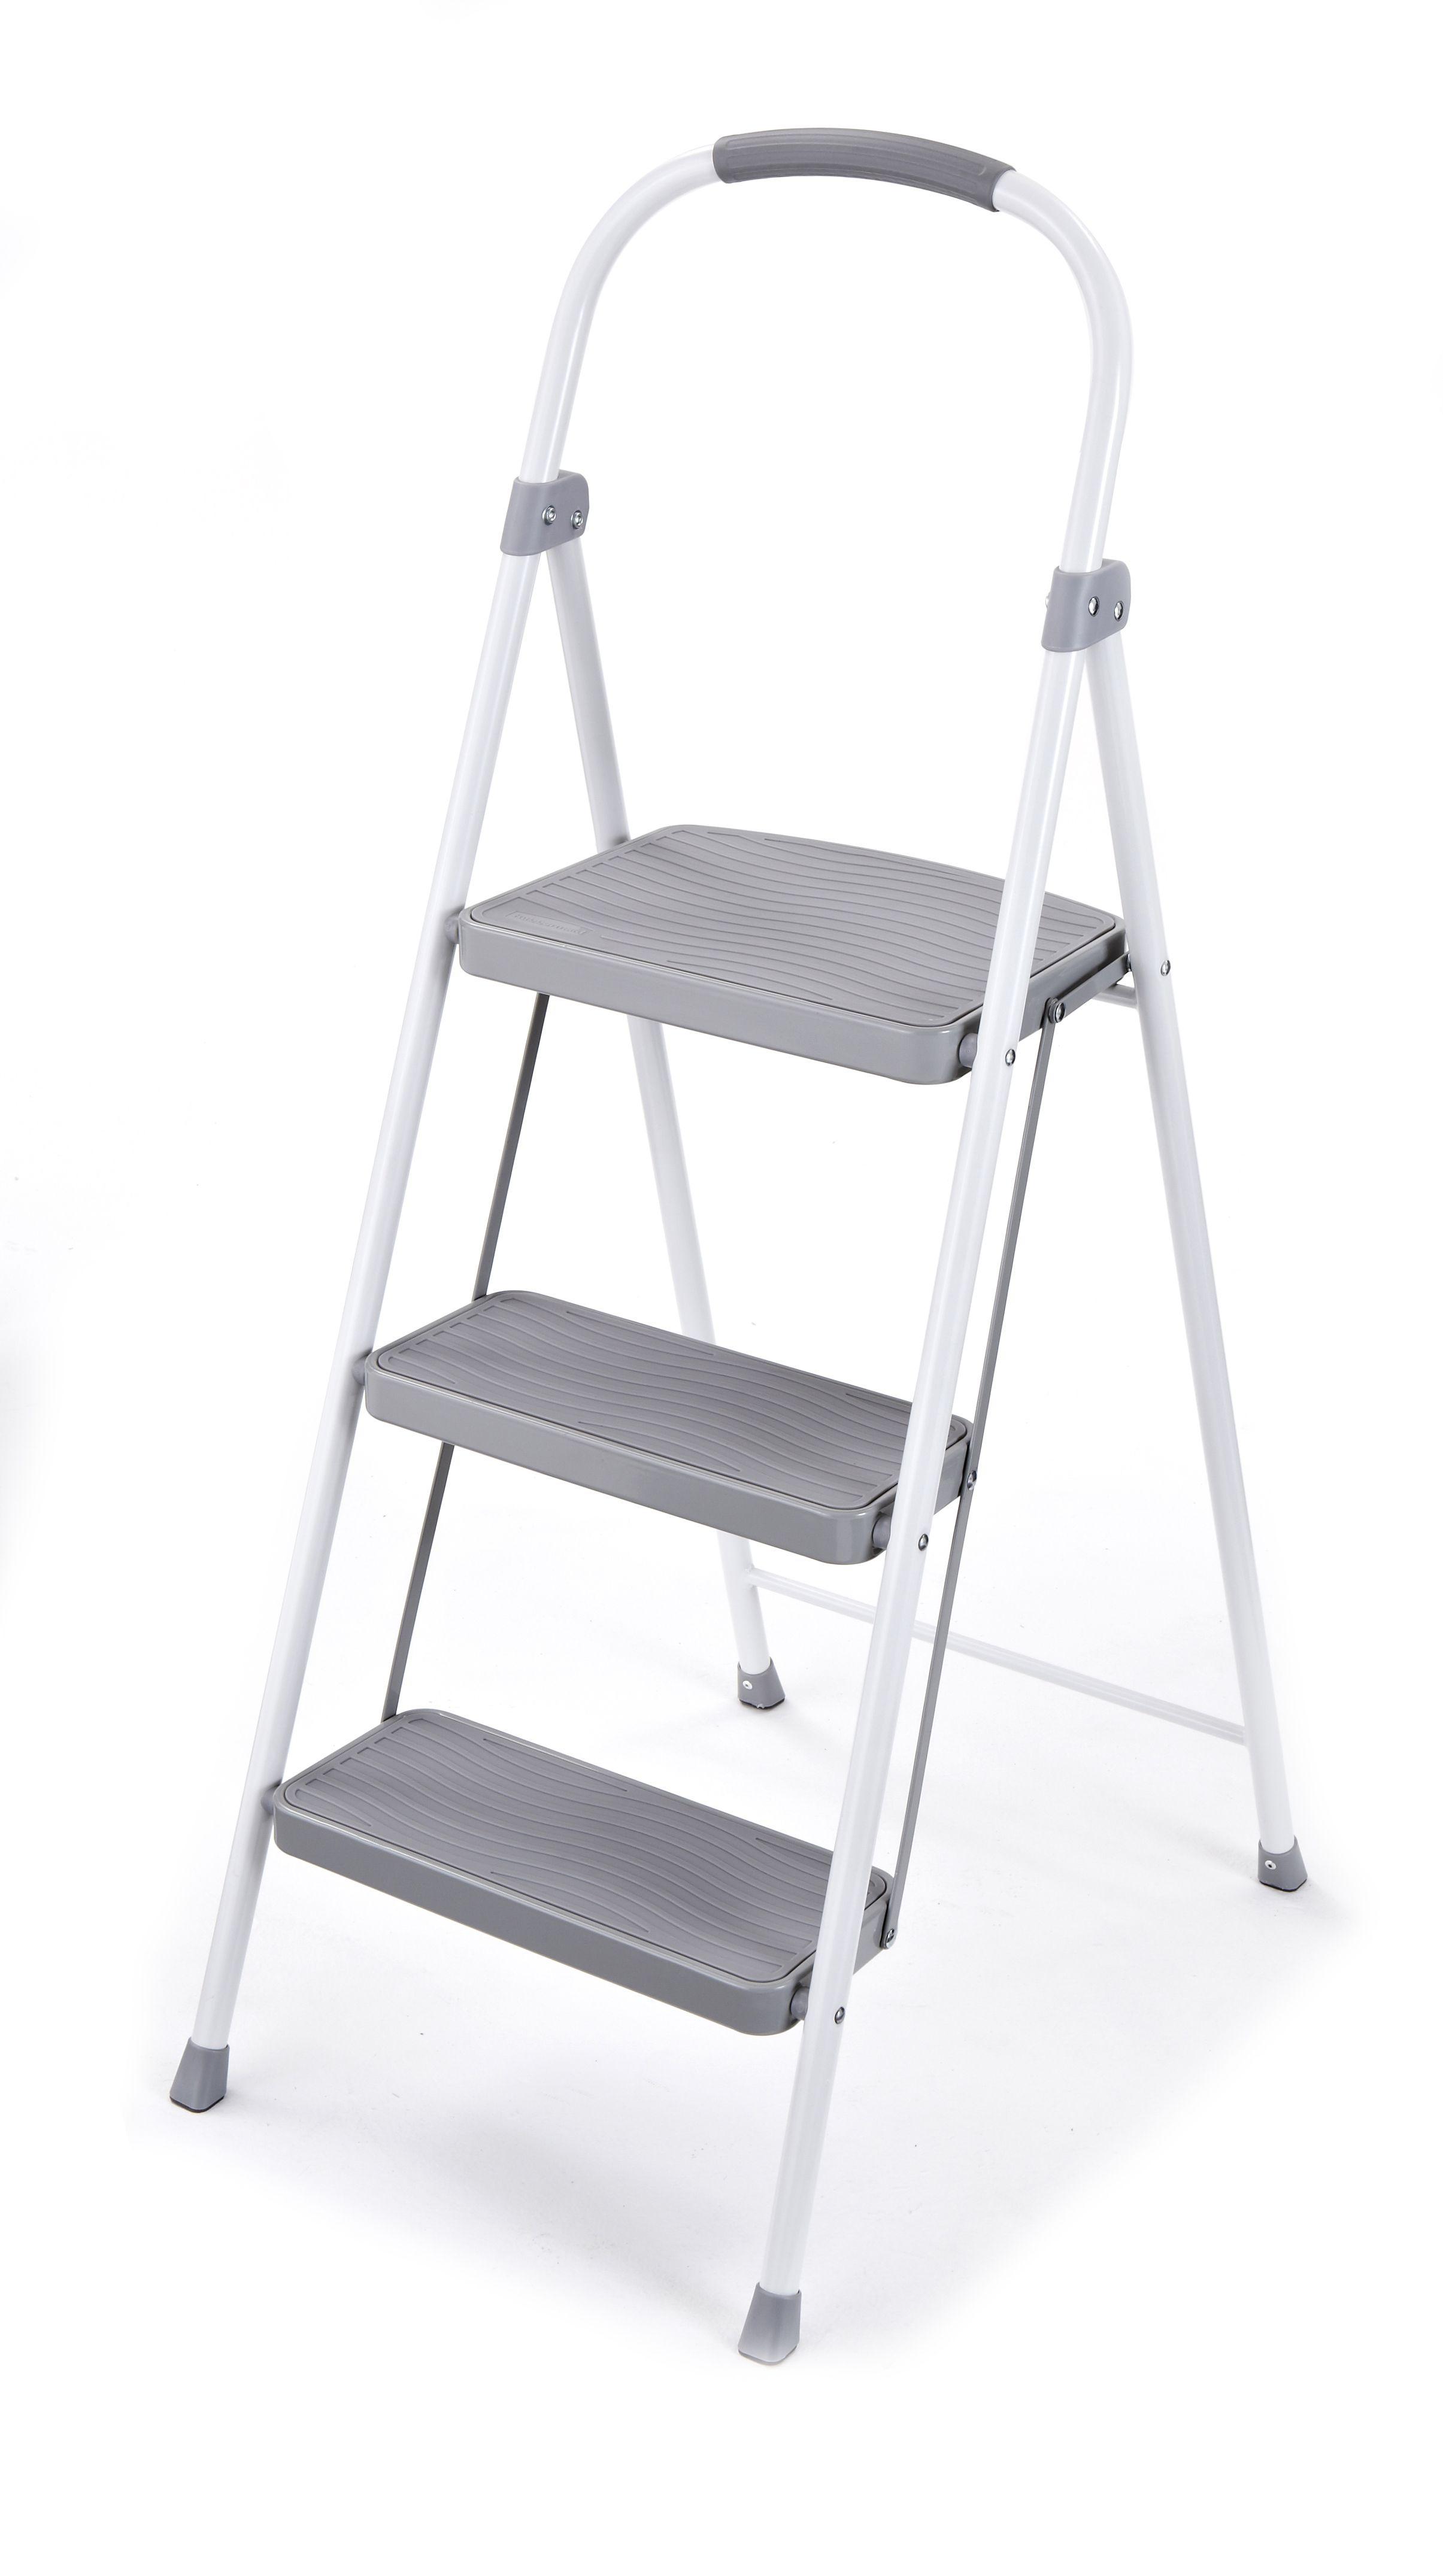 Home improvement stool 3 step stool steel